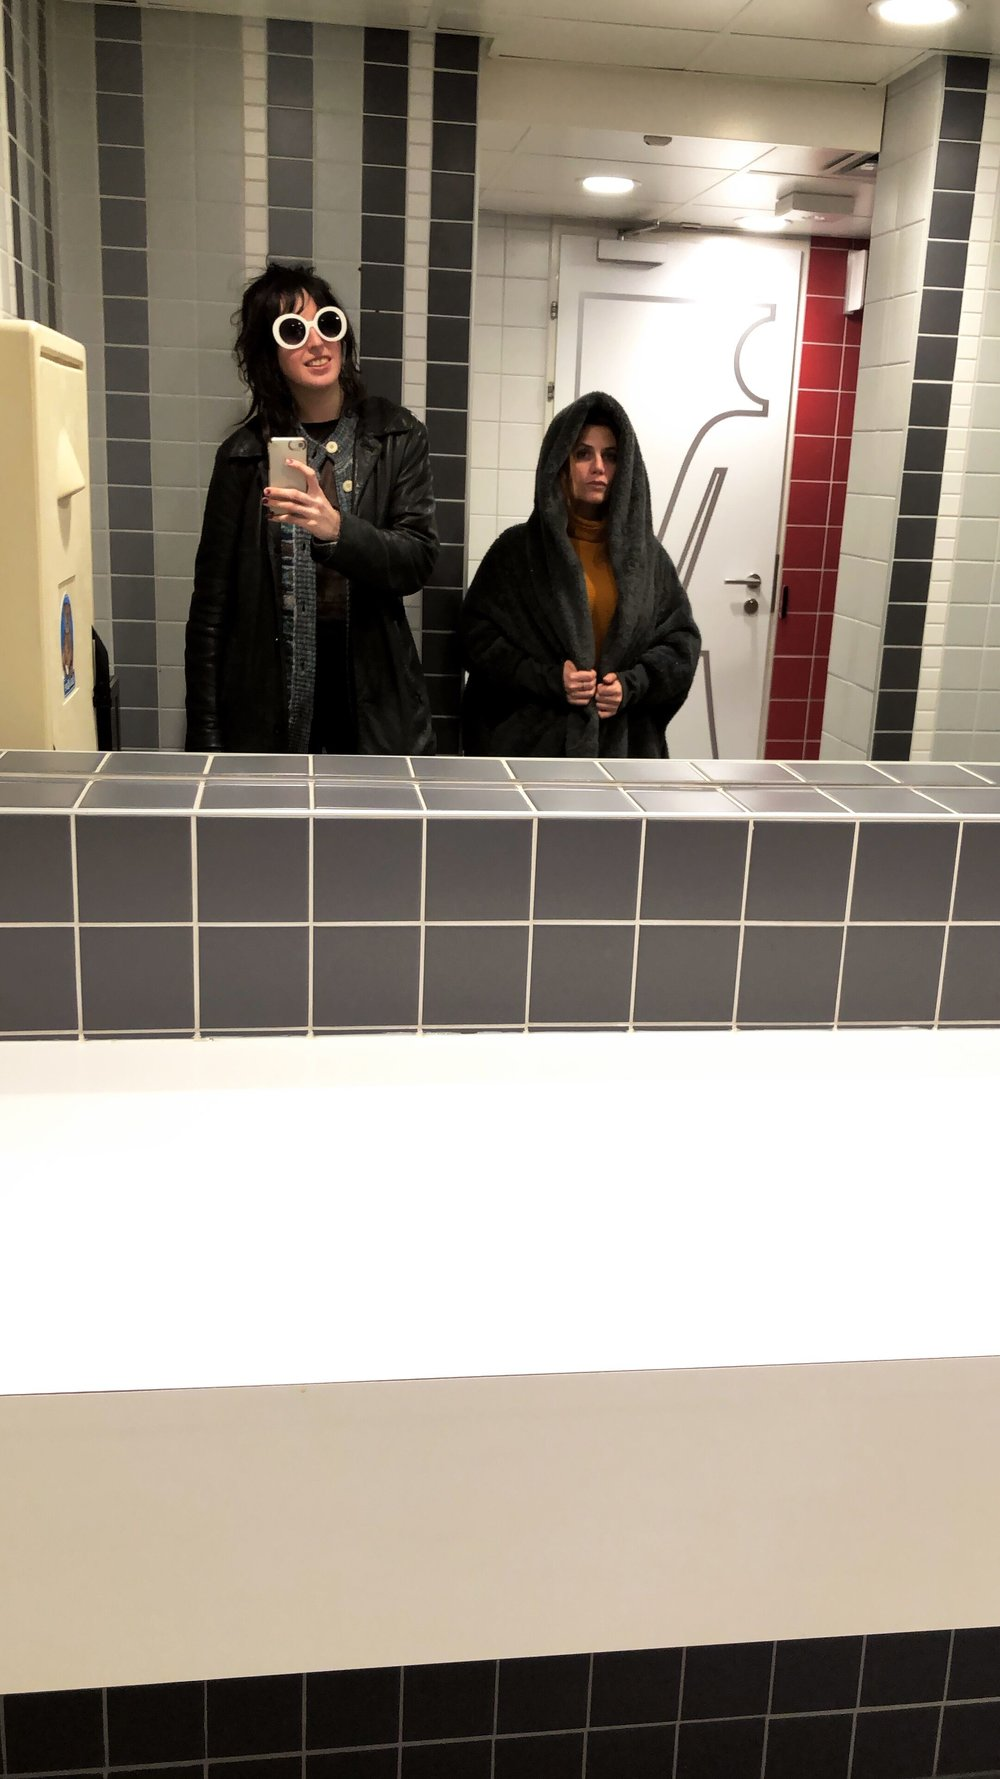 Sole Bathroom Selfie of the Tour